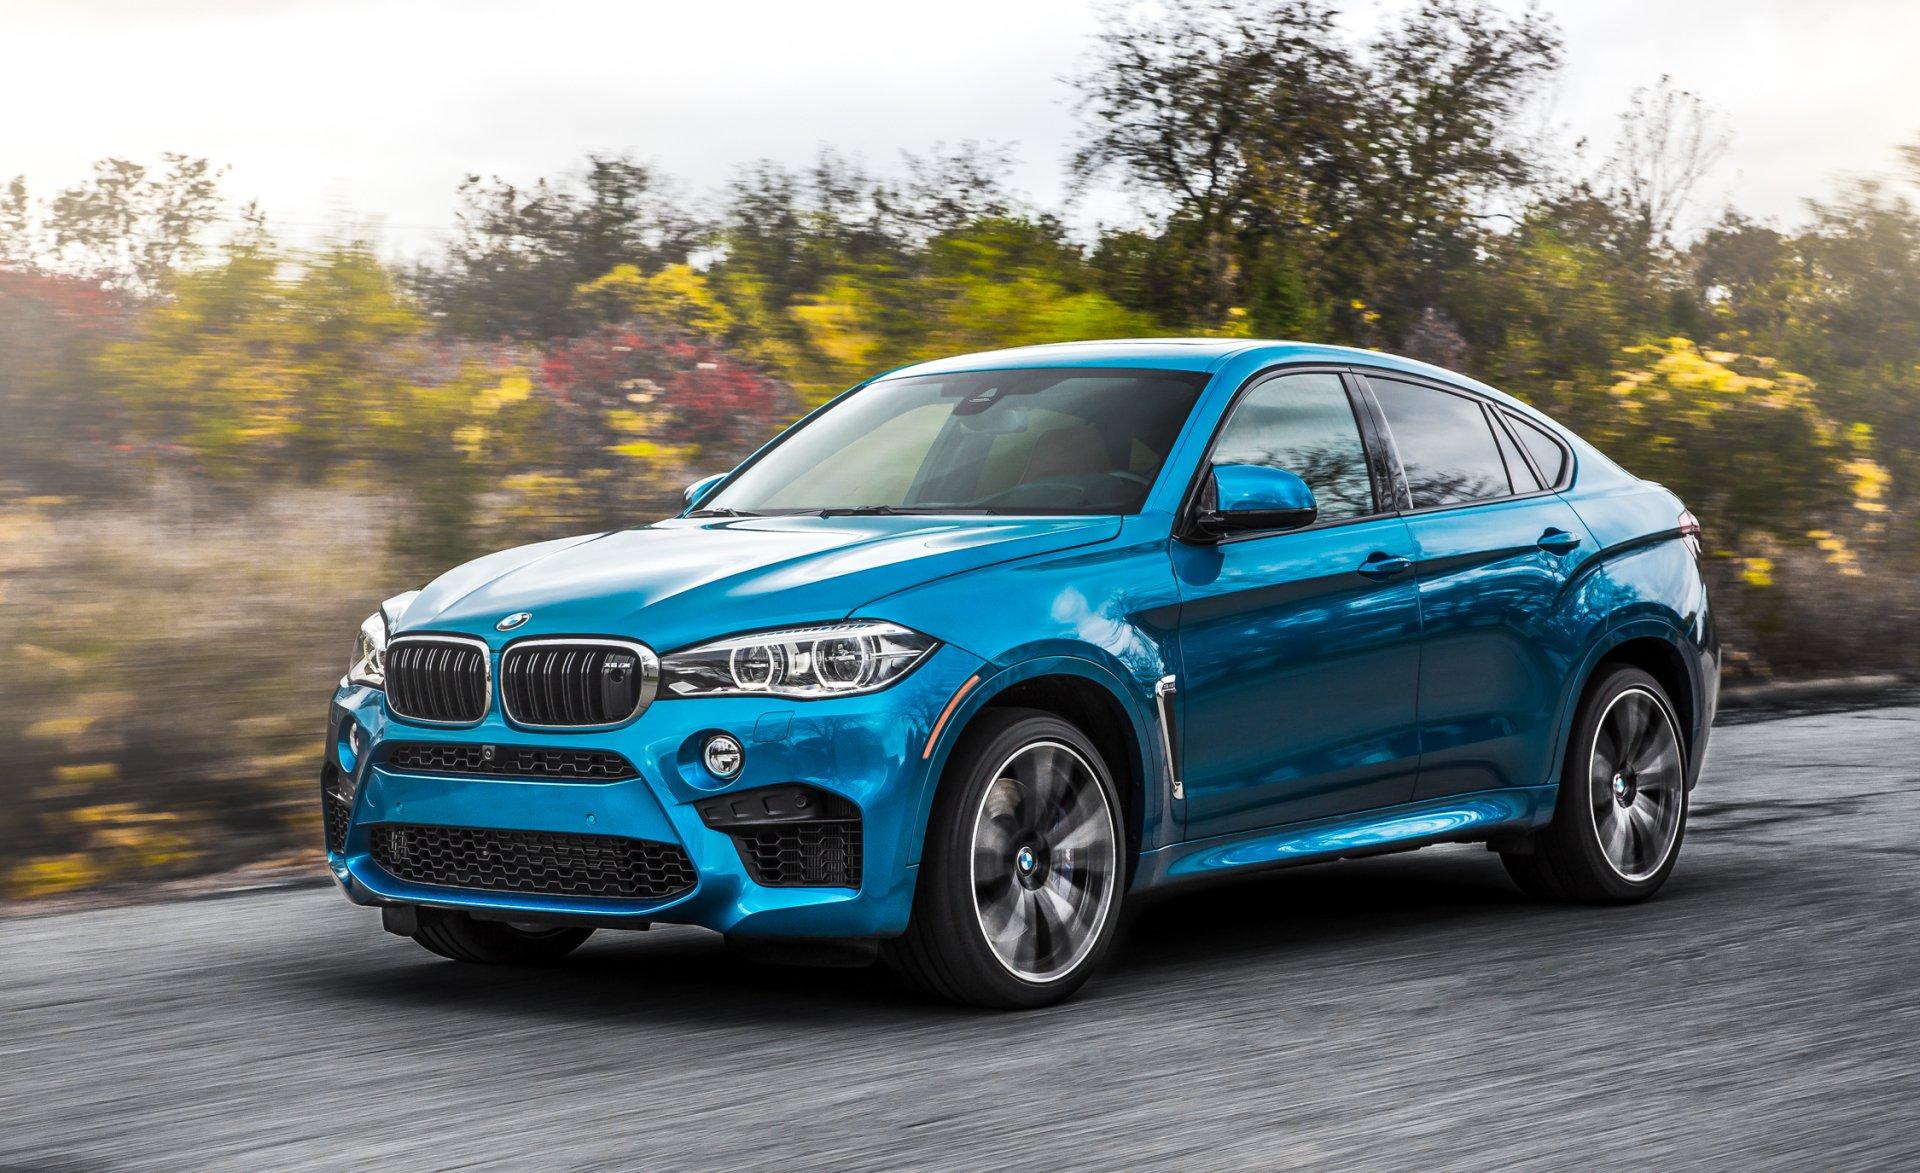 BMW X6 Fond d'écran HD | Arrière-Plan | 2250x1375 | ID ...